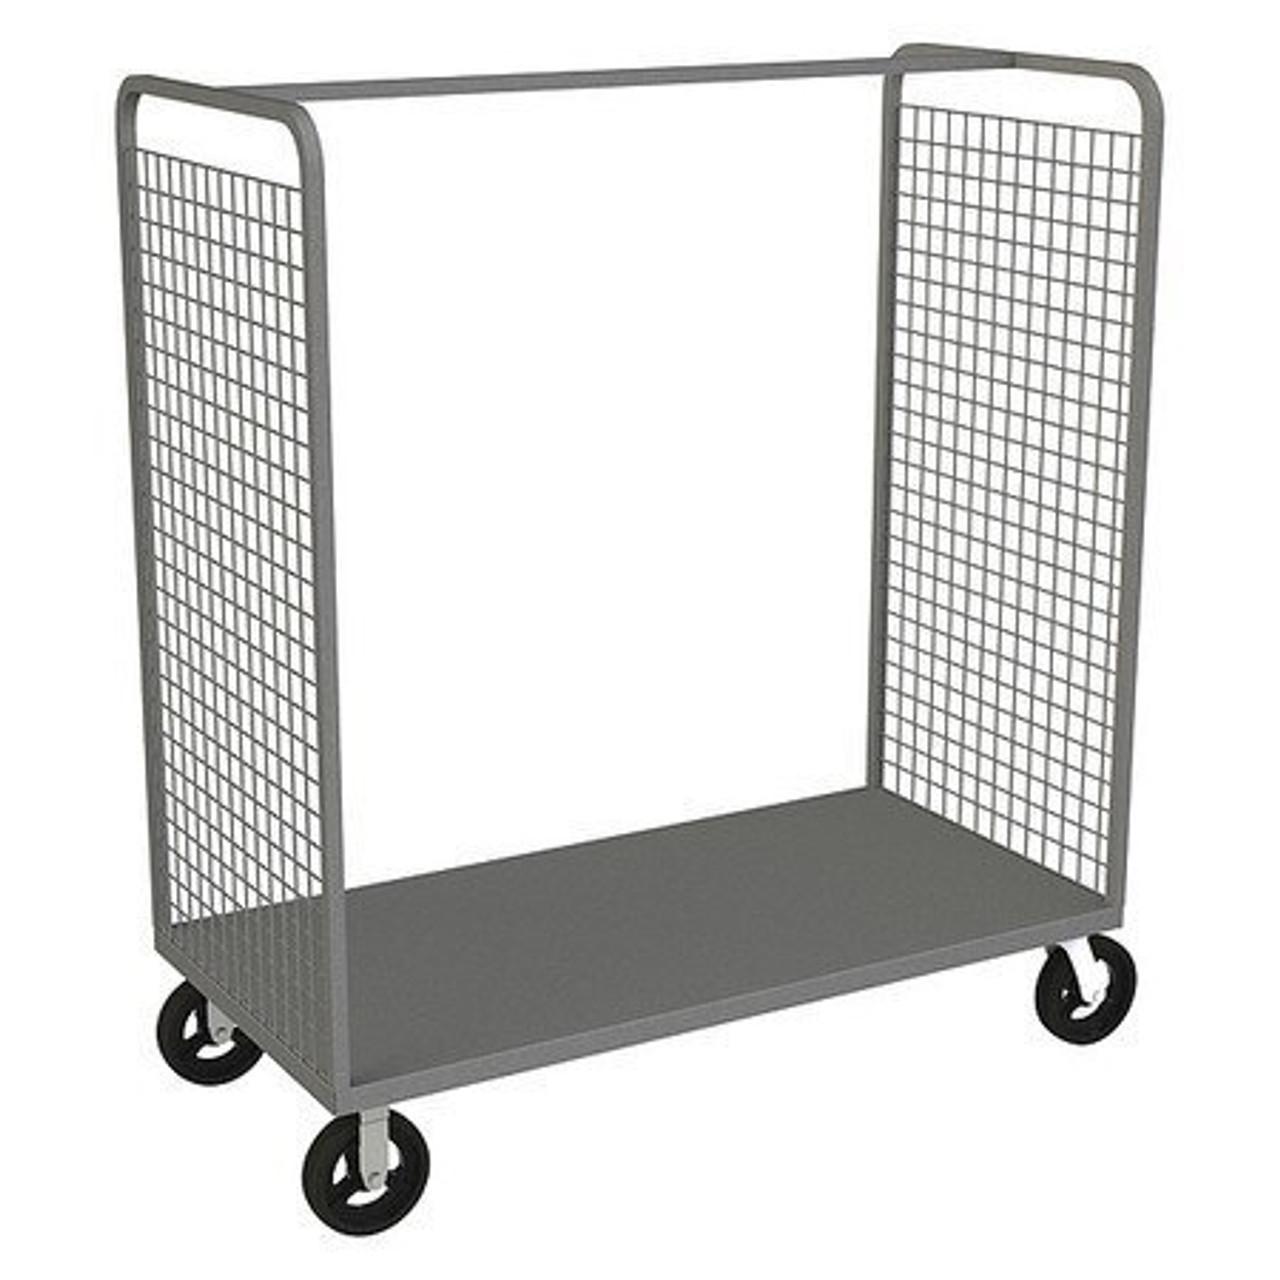 DURHAM W2ST-306068-1-8MR95, Wire Cart, 1 shelf